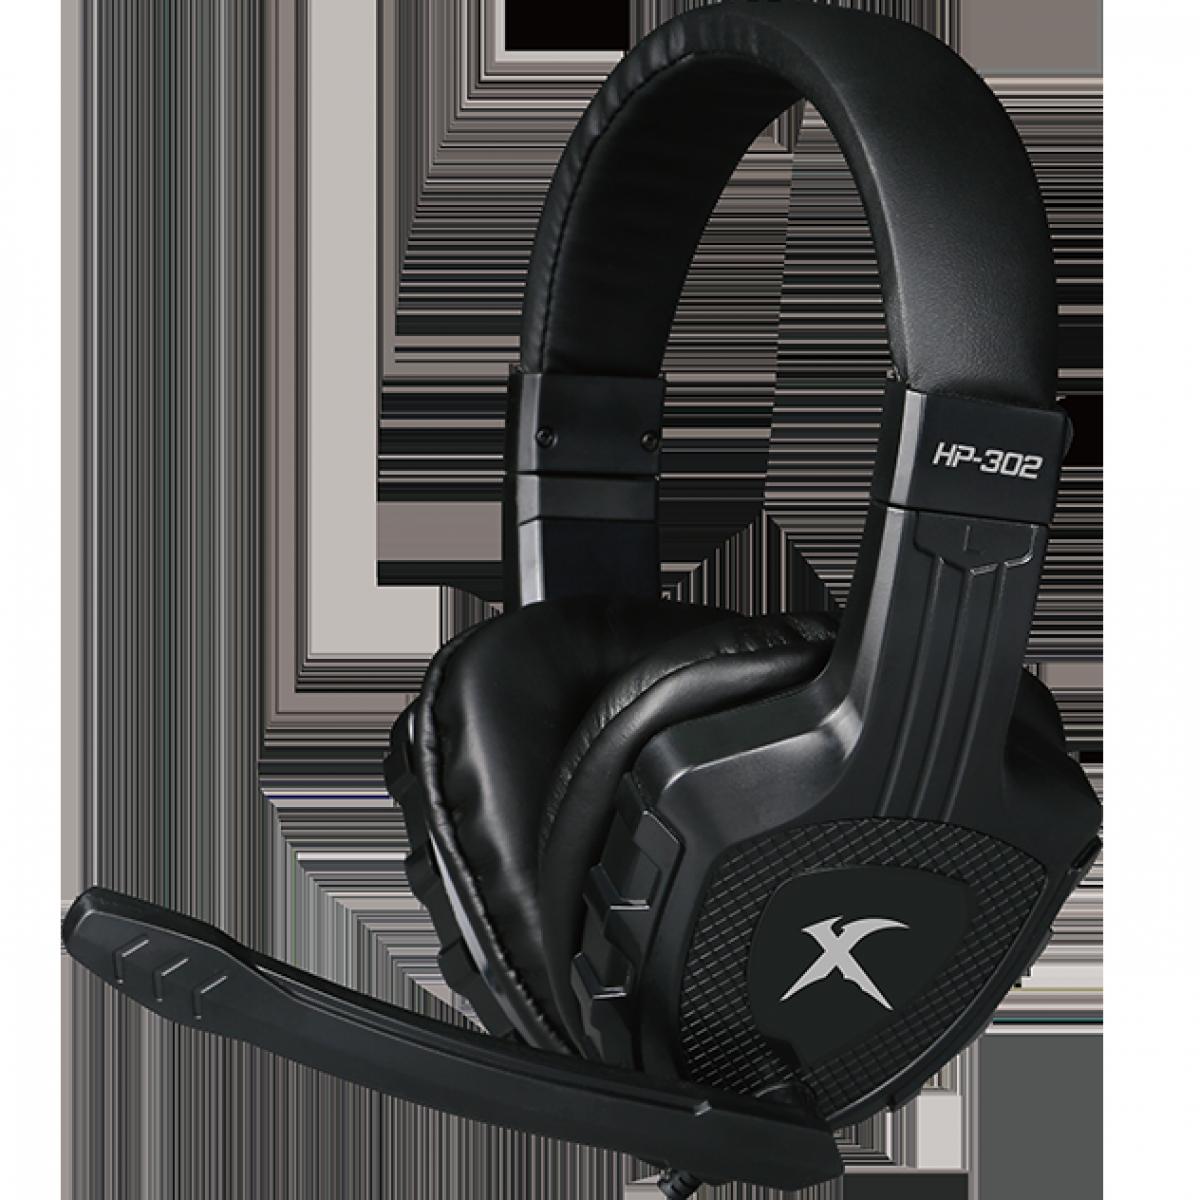 Headset Gamer XTRIKE-ME HP-302, Black, Backlit, HP302BK